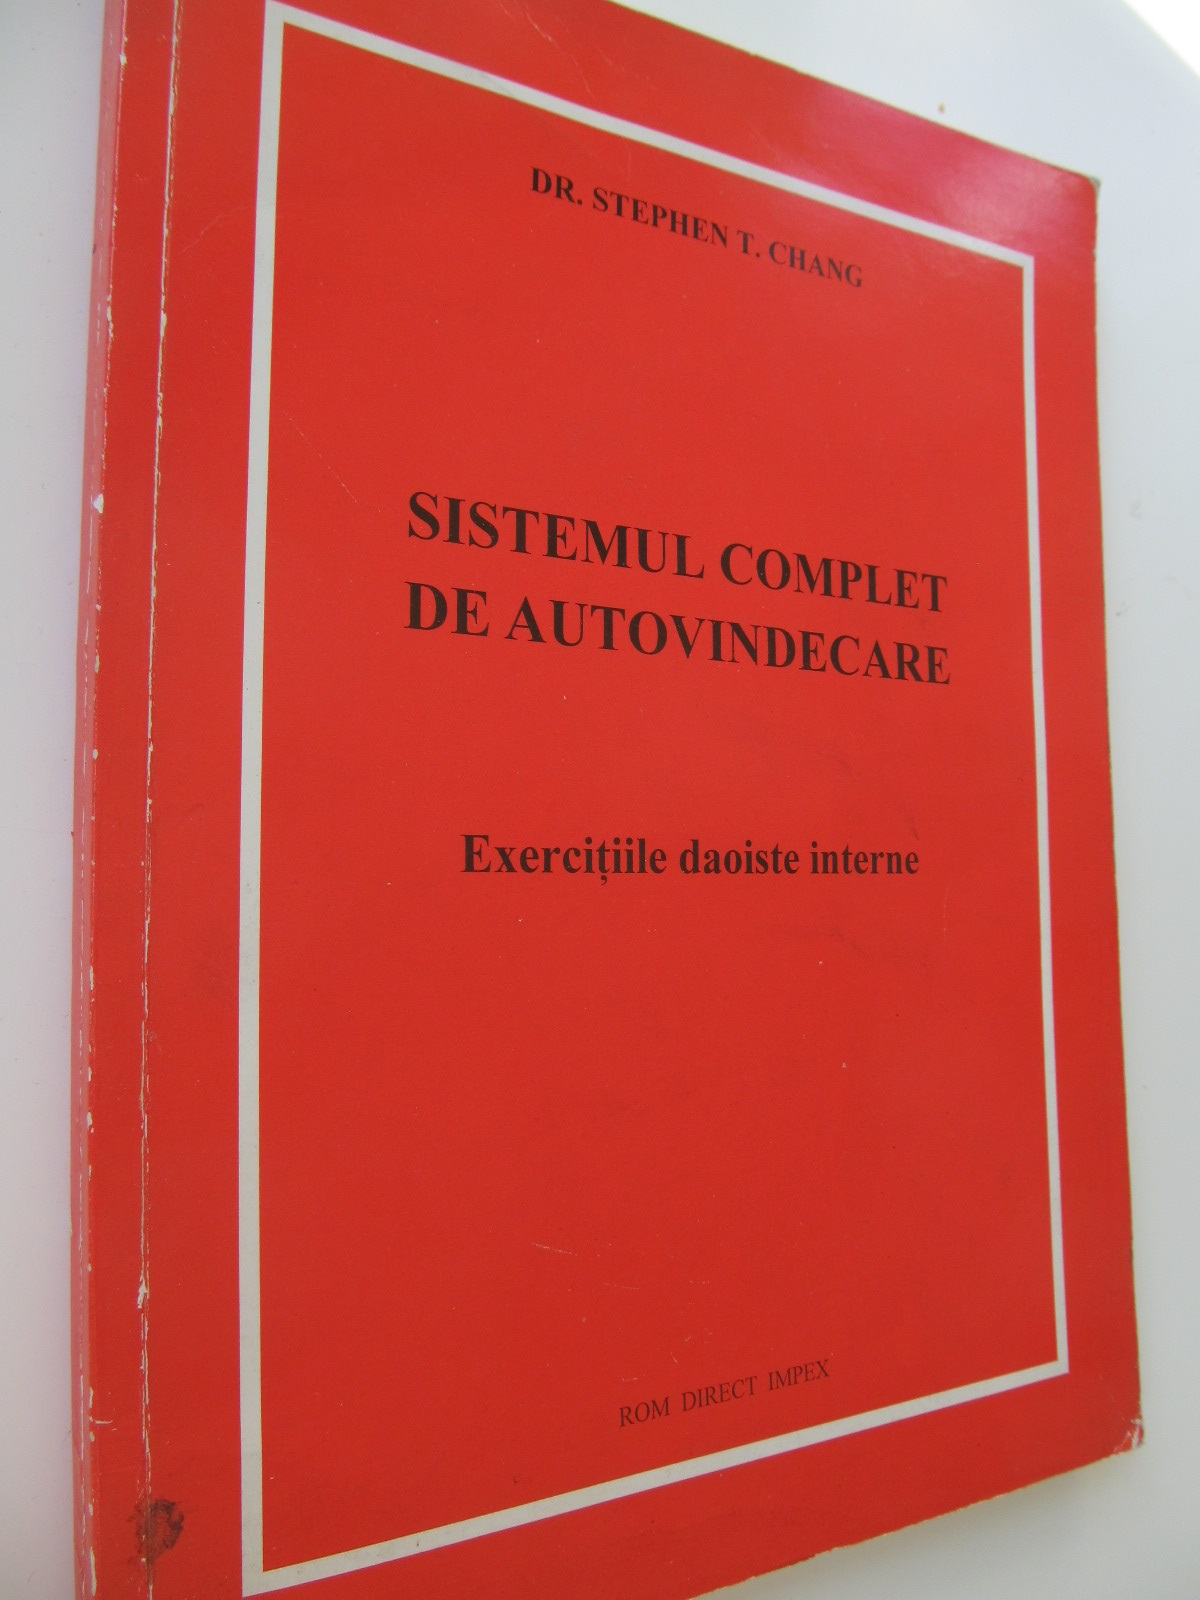 Sistemul complet de autovindecare - Exercitii daoiste interne - Stephen T. Chang | Detalii carte